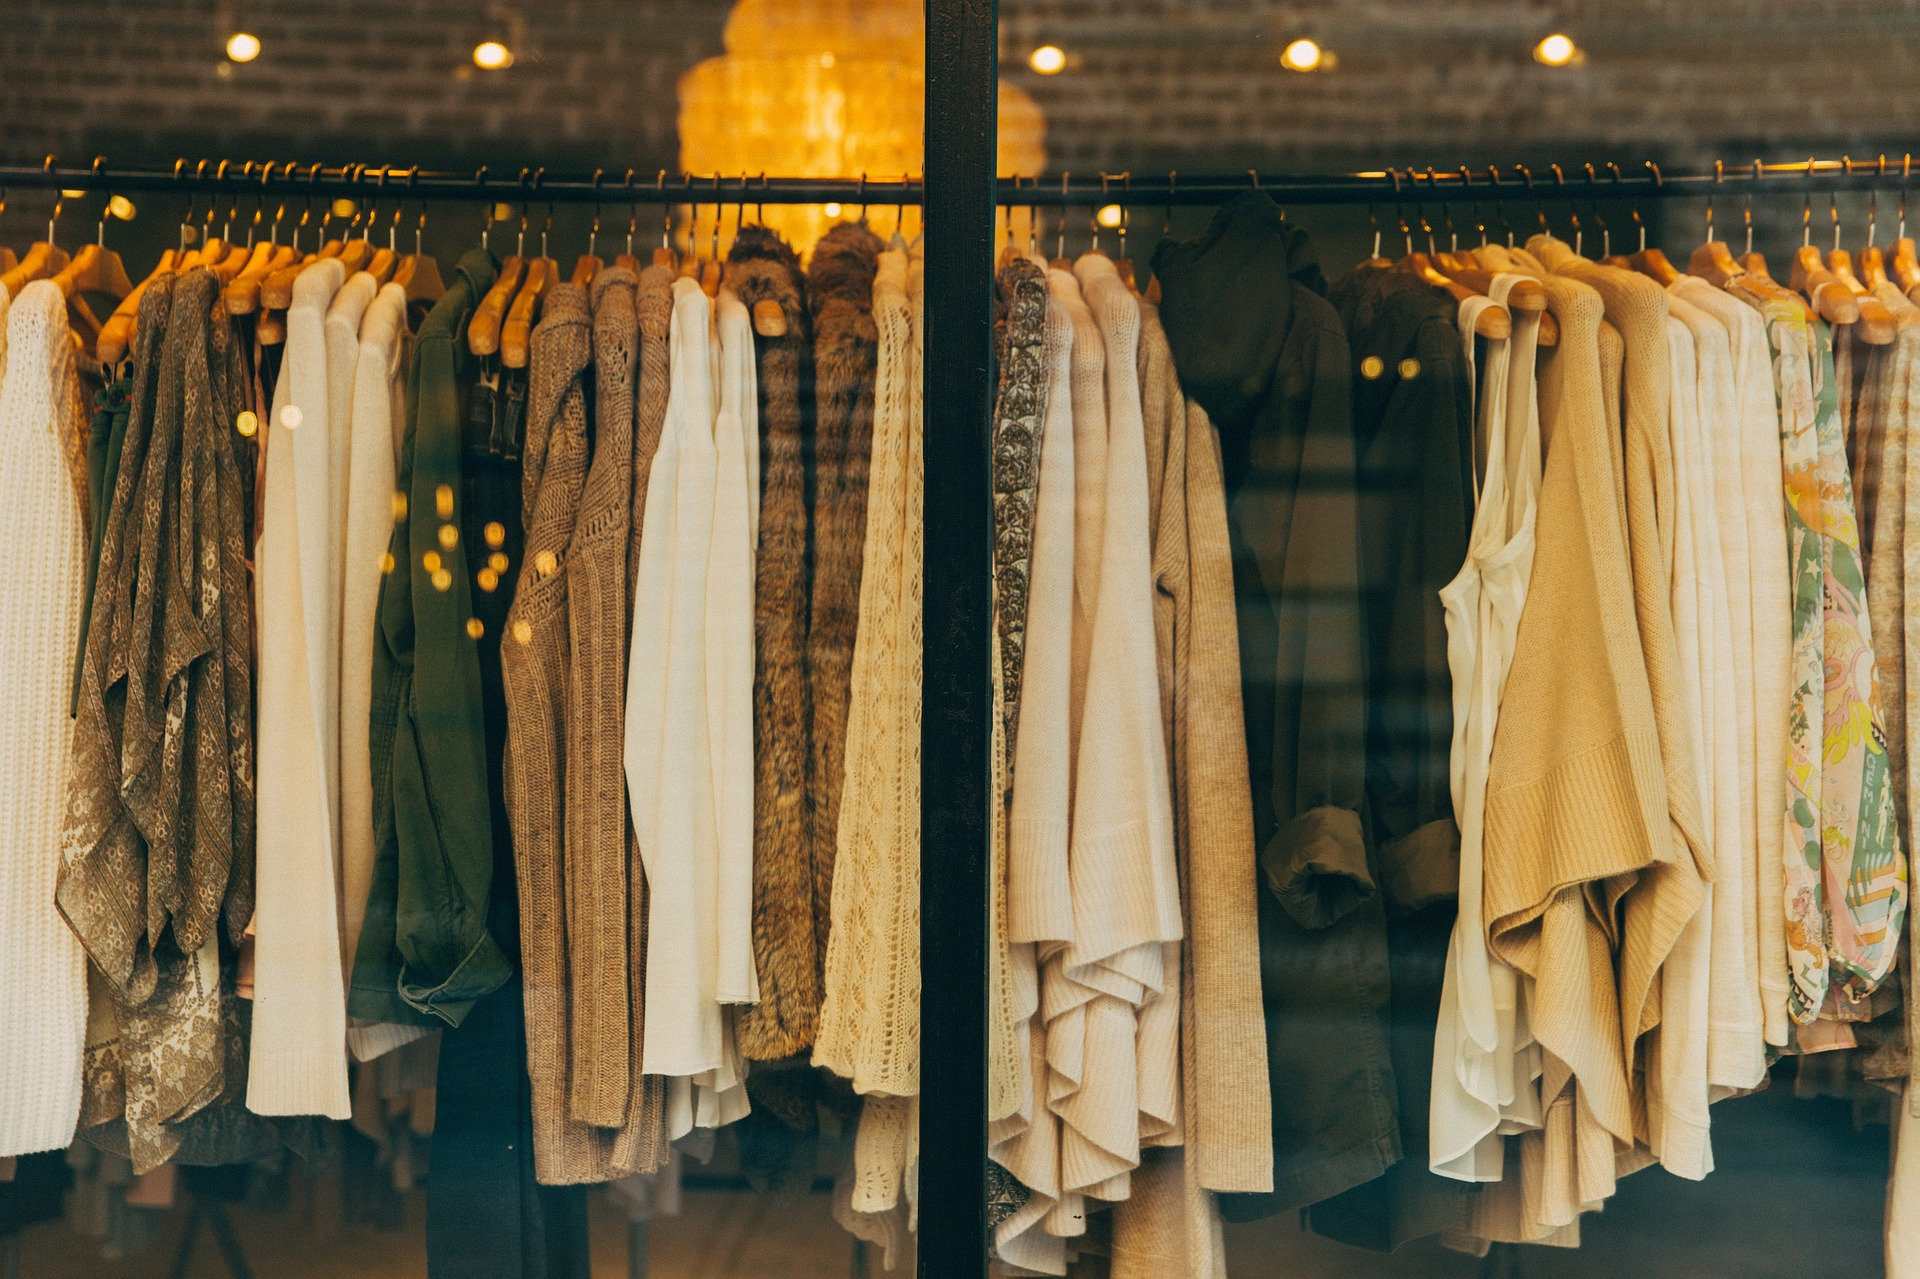 Dé items voor je kledingkast